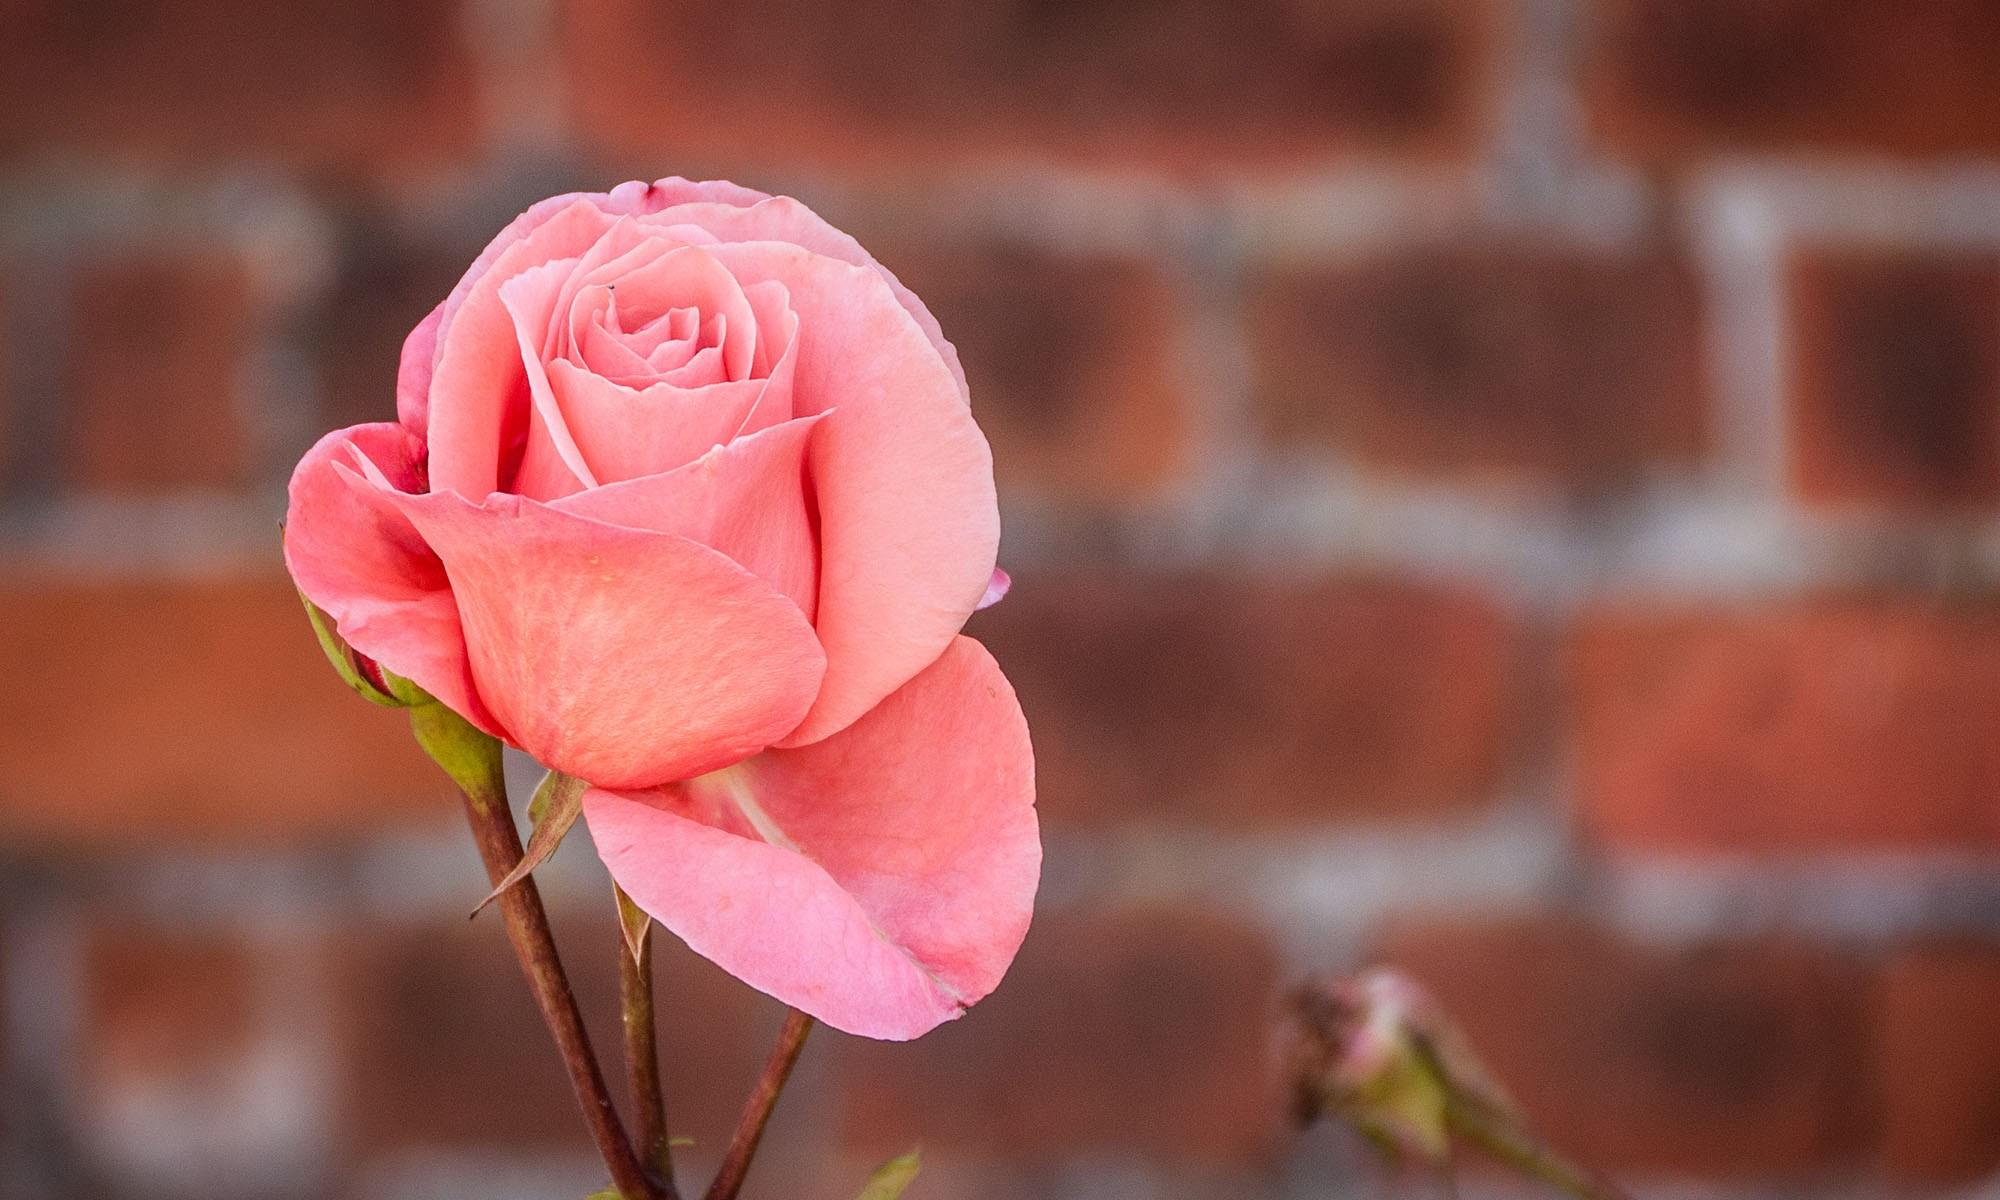 Pink Rose on Brick Background